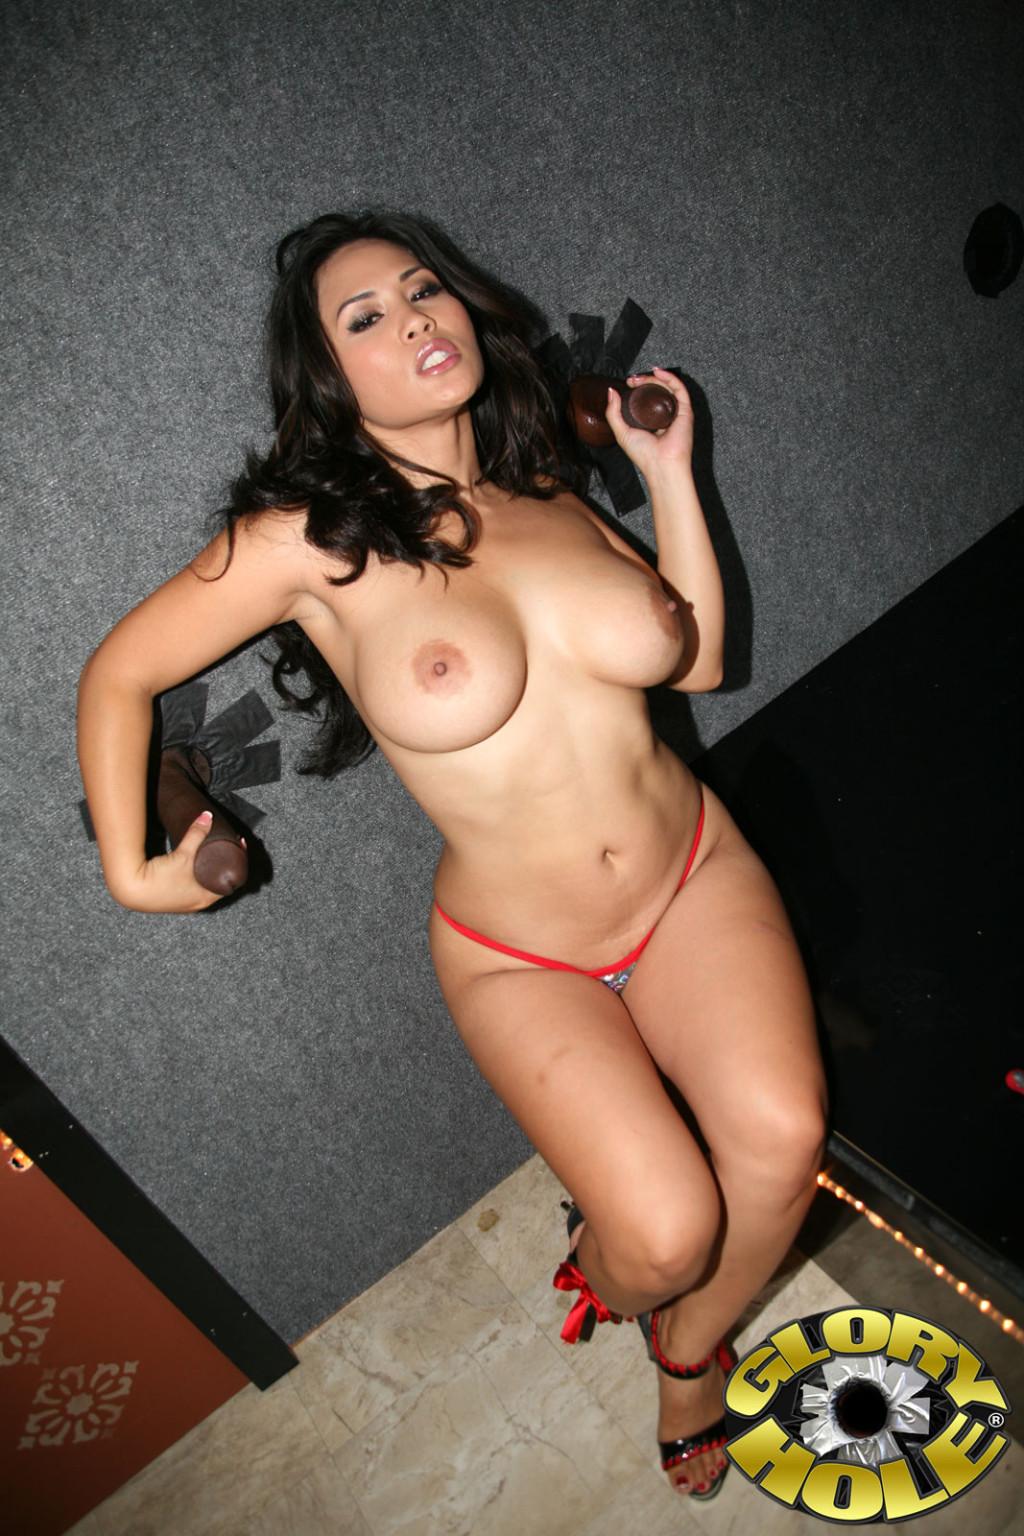 Nude of little german girl